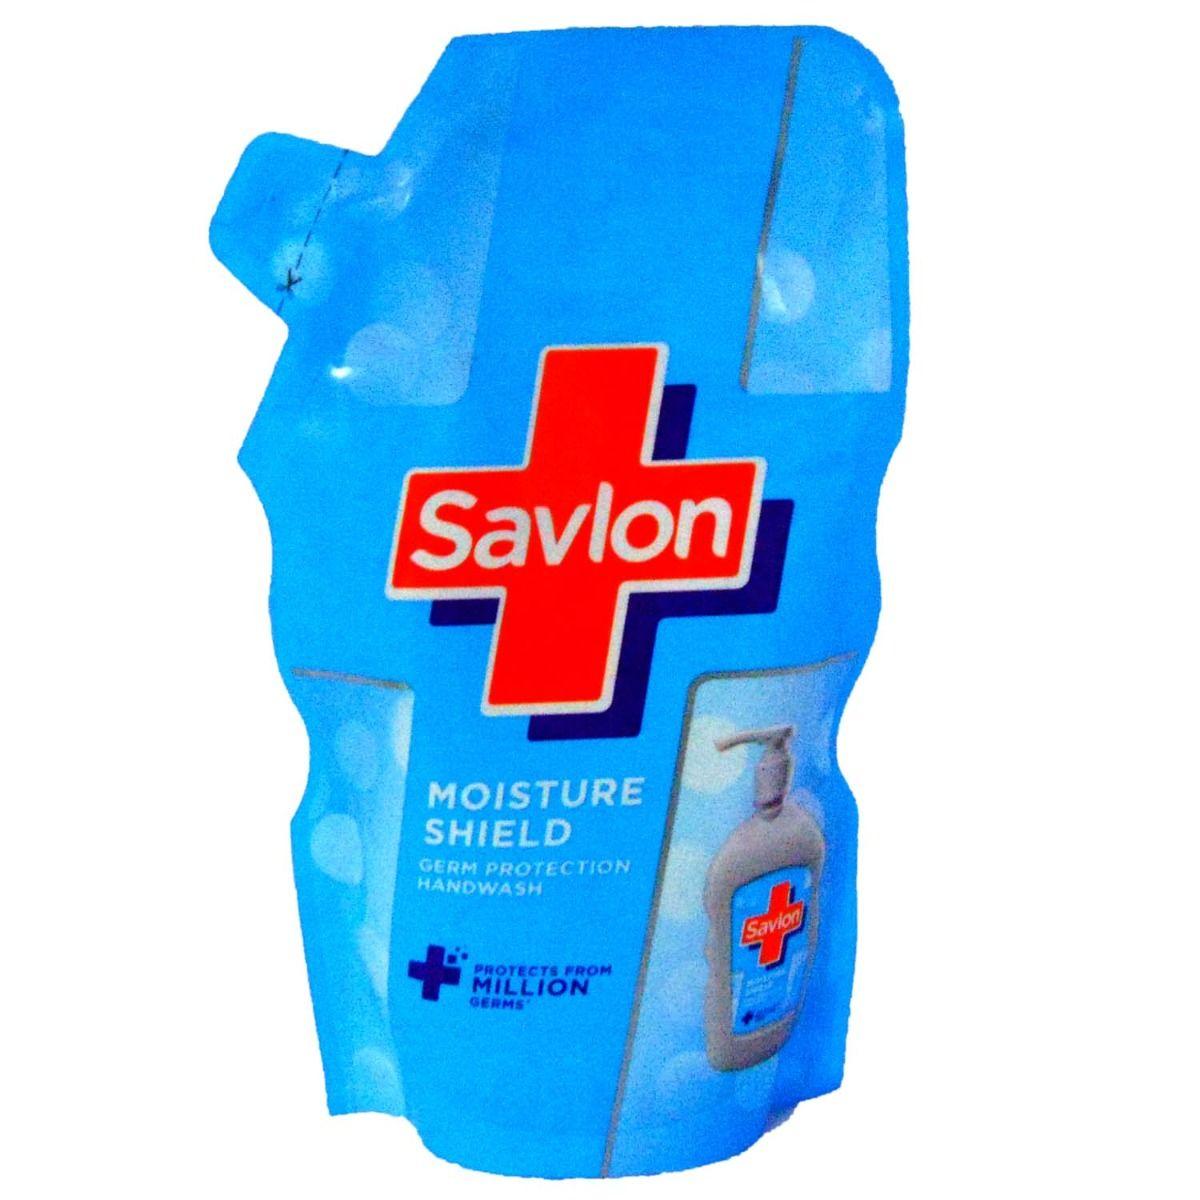 Savlon Moisture Shield Germ Protection Handwash, 175 ml Refill Pack